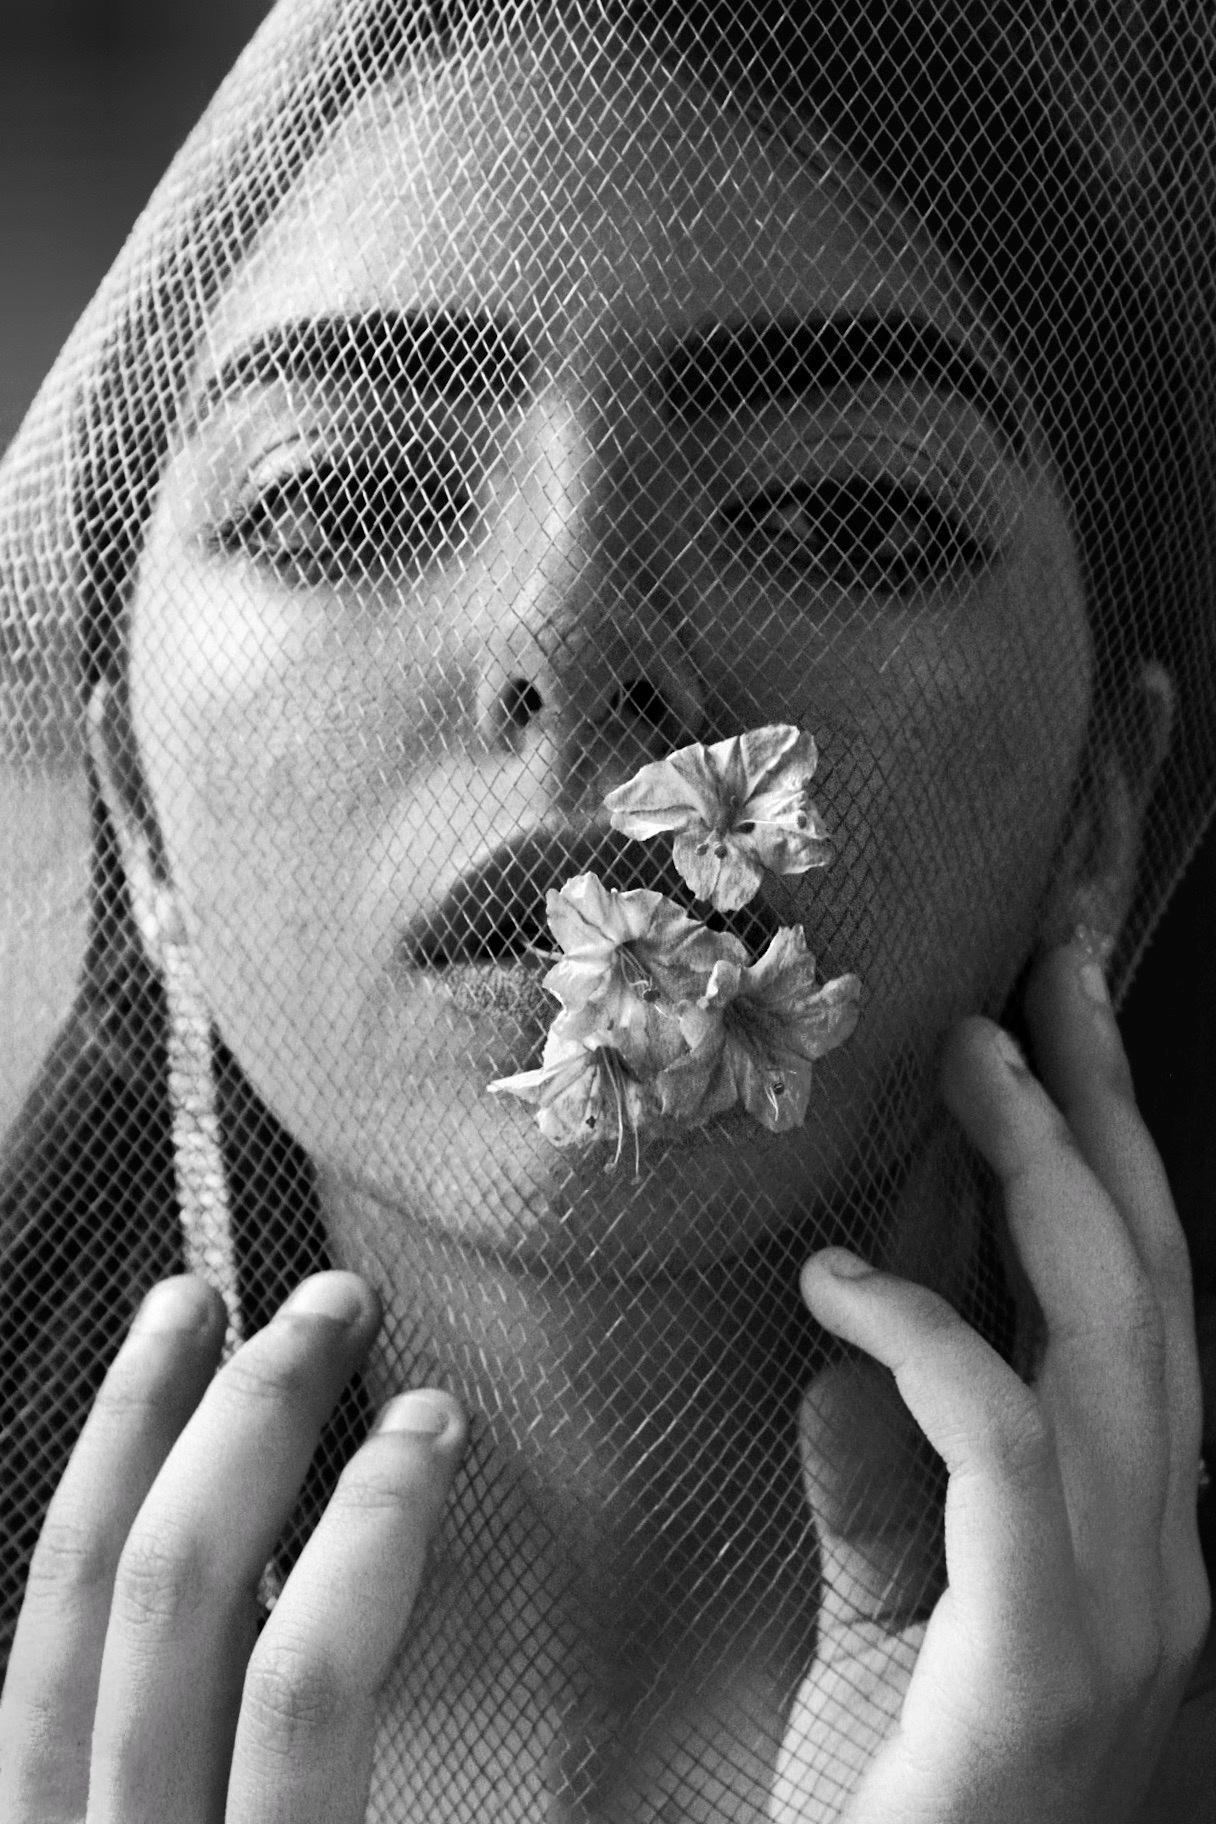 Categoria: Glamour, Portrait - Photographer: GIULIA TIANO - Model: __brownie.____ - Location: Cosenza, CS, Italia